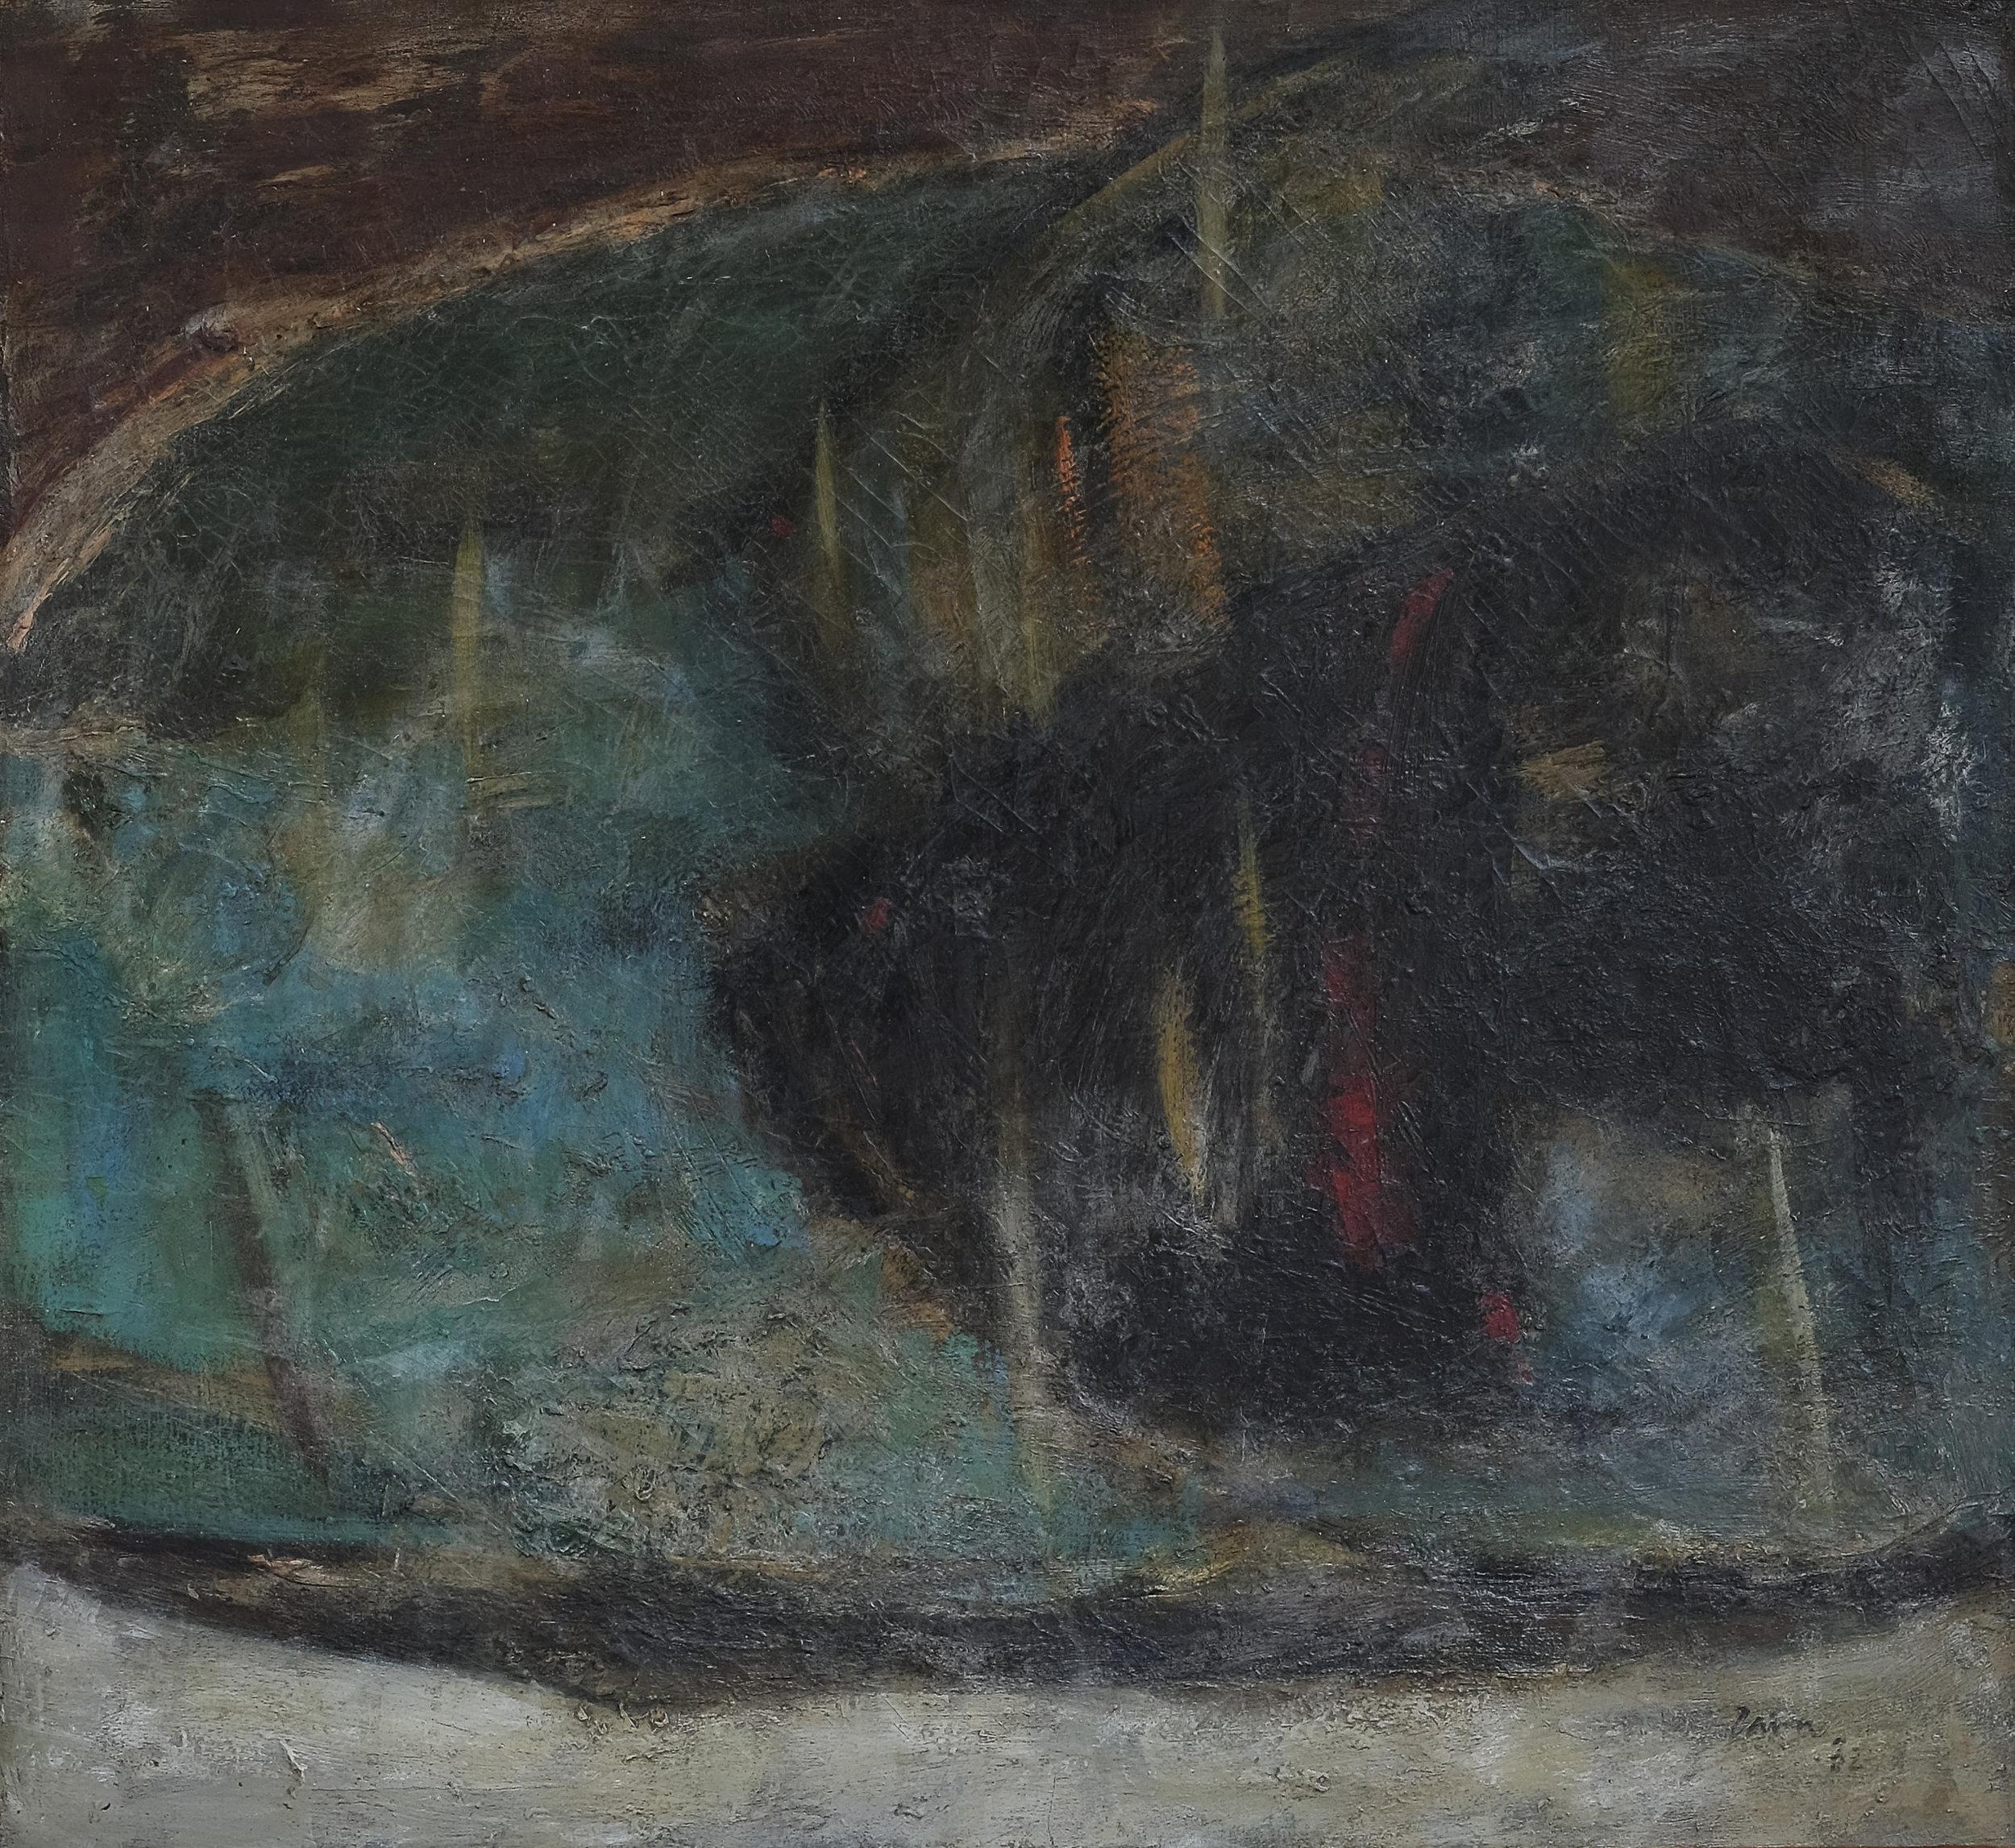 Zaini, Ikan (Fish), oil on canvas, 70 x 60 cm, 1975